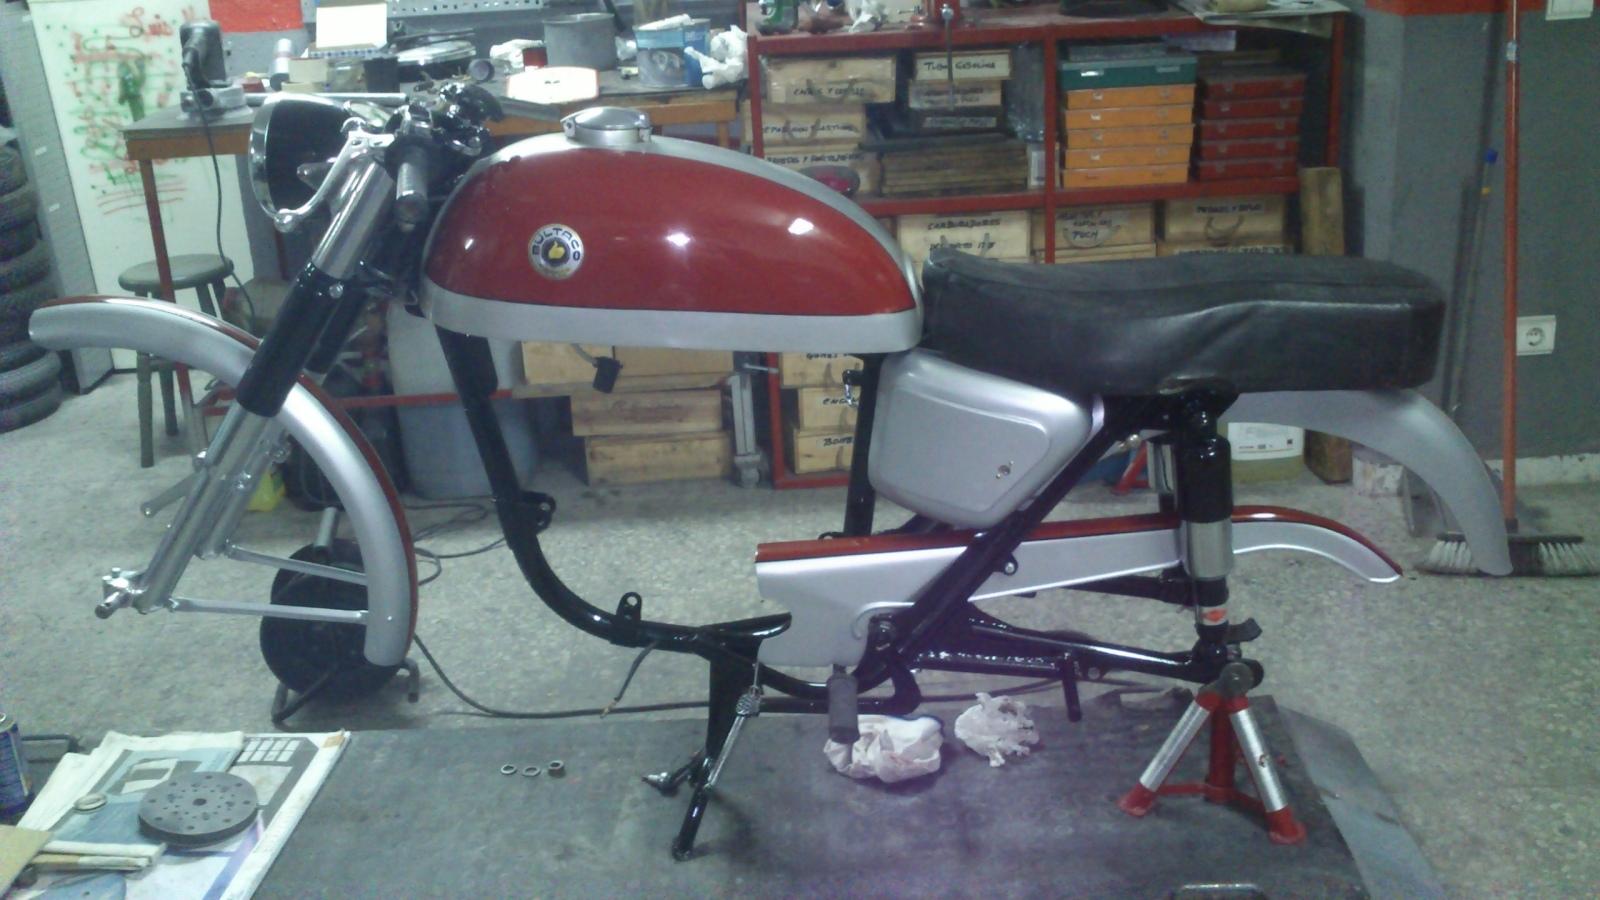 De vuelta a la carretera: Bultaco Tralla 102 Vih5so